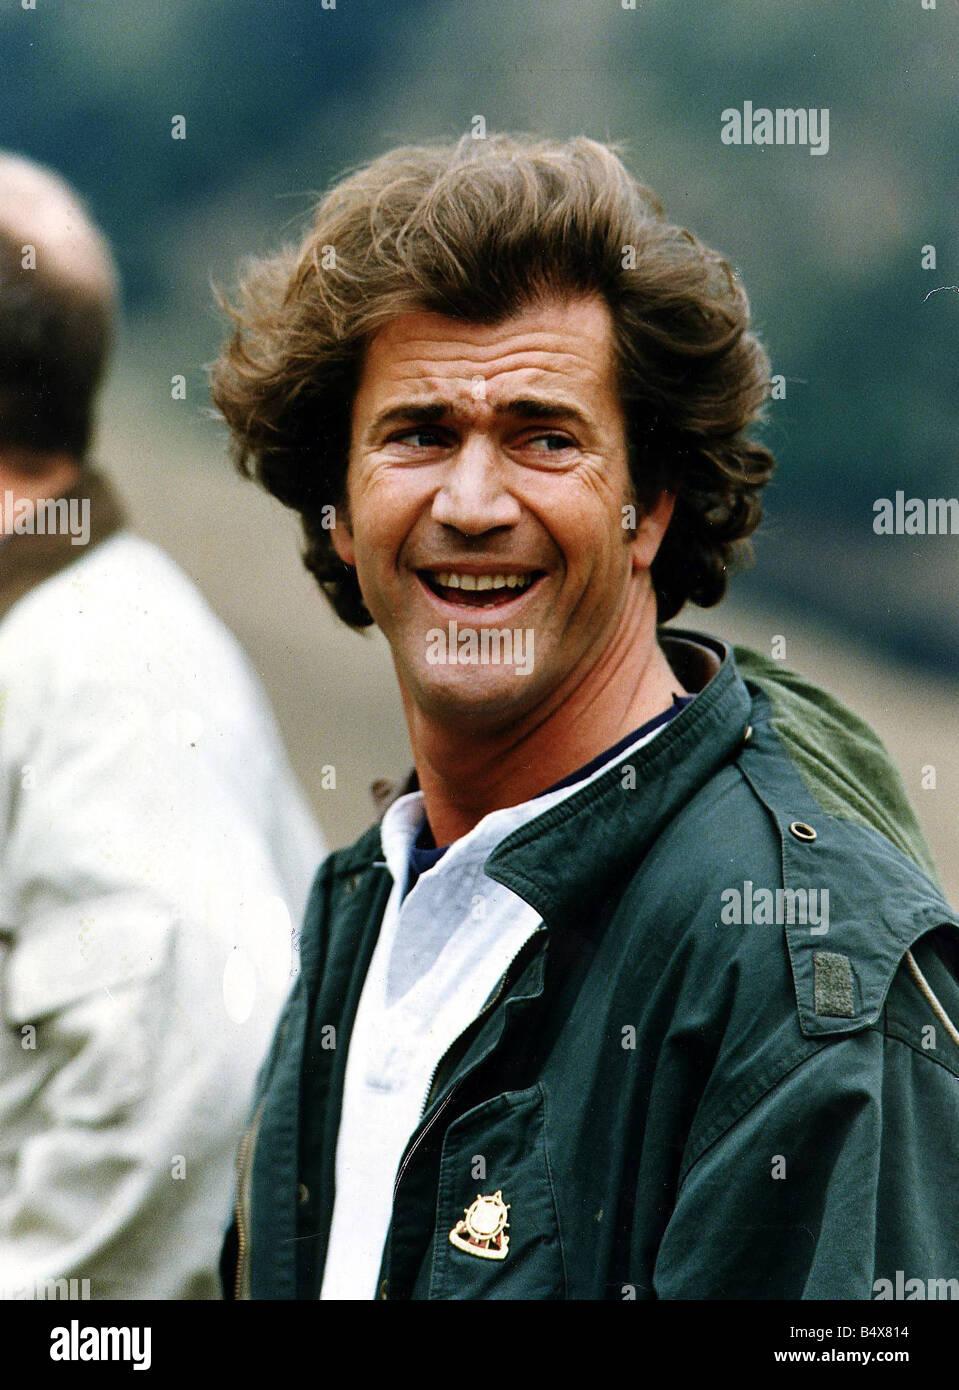 mel gibson actor filming braveheart in glen nevis scotland wearing